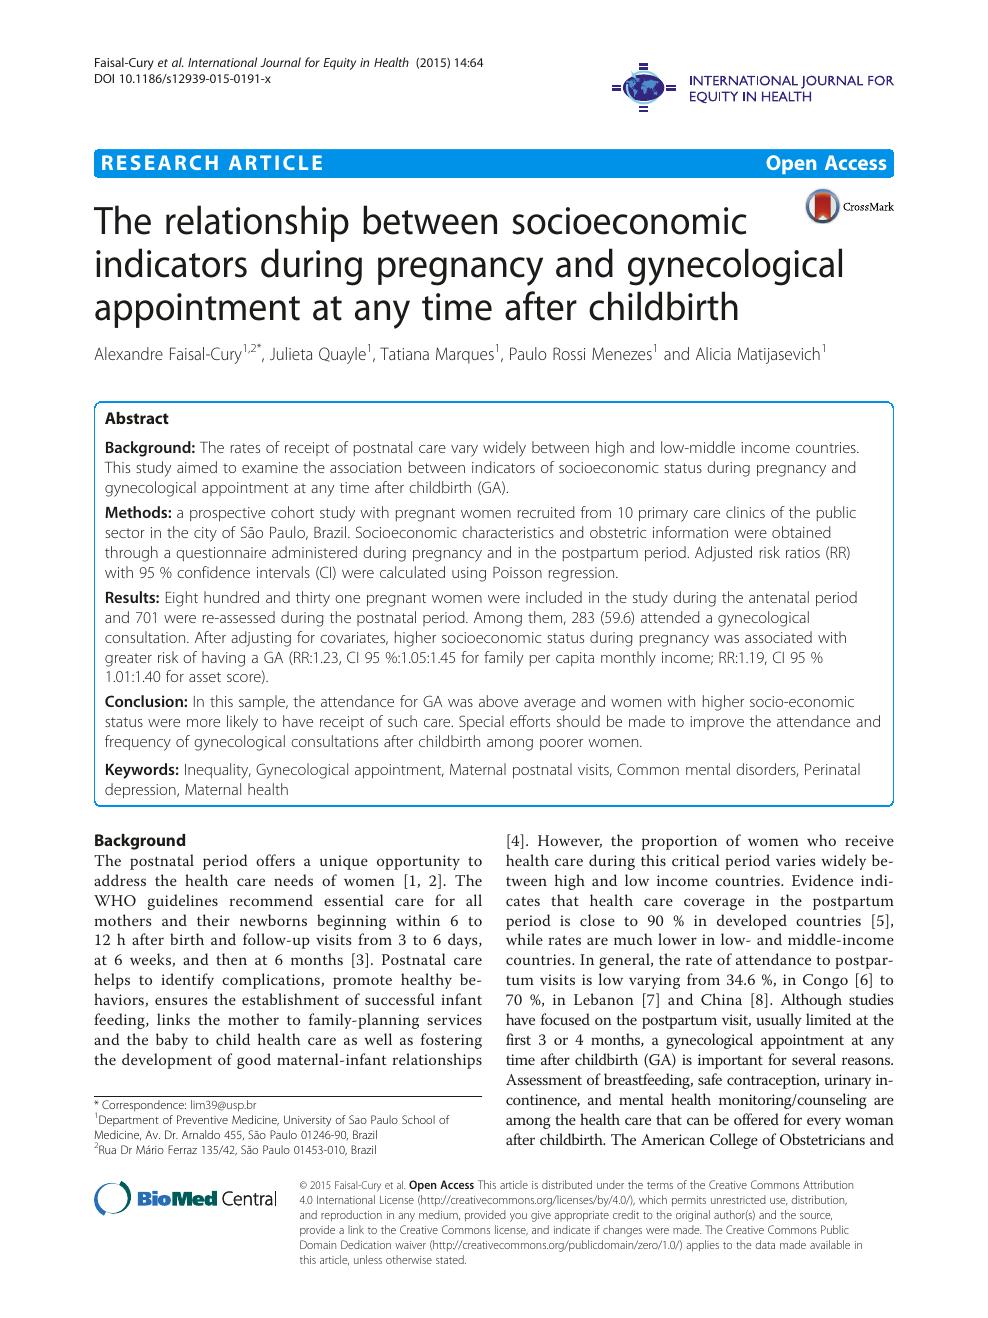 The relationship between socioeconomic indicators during pregnancy